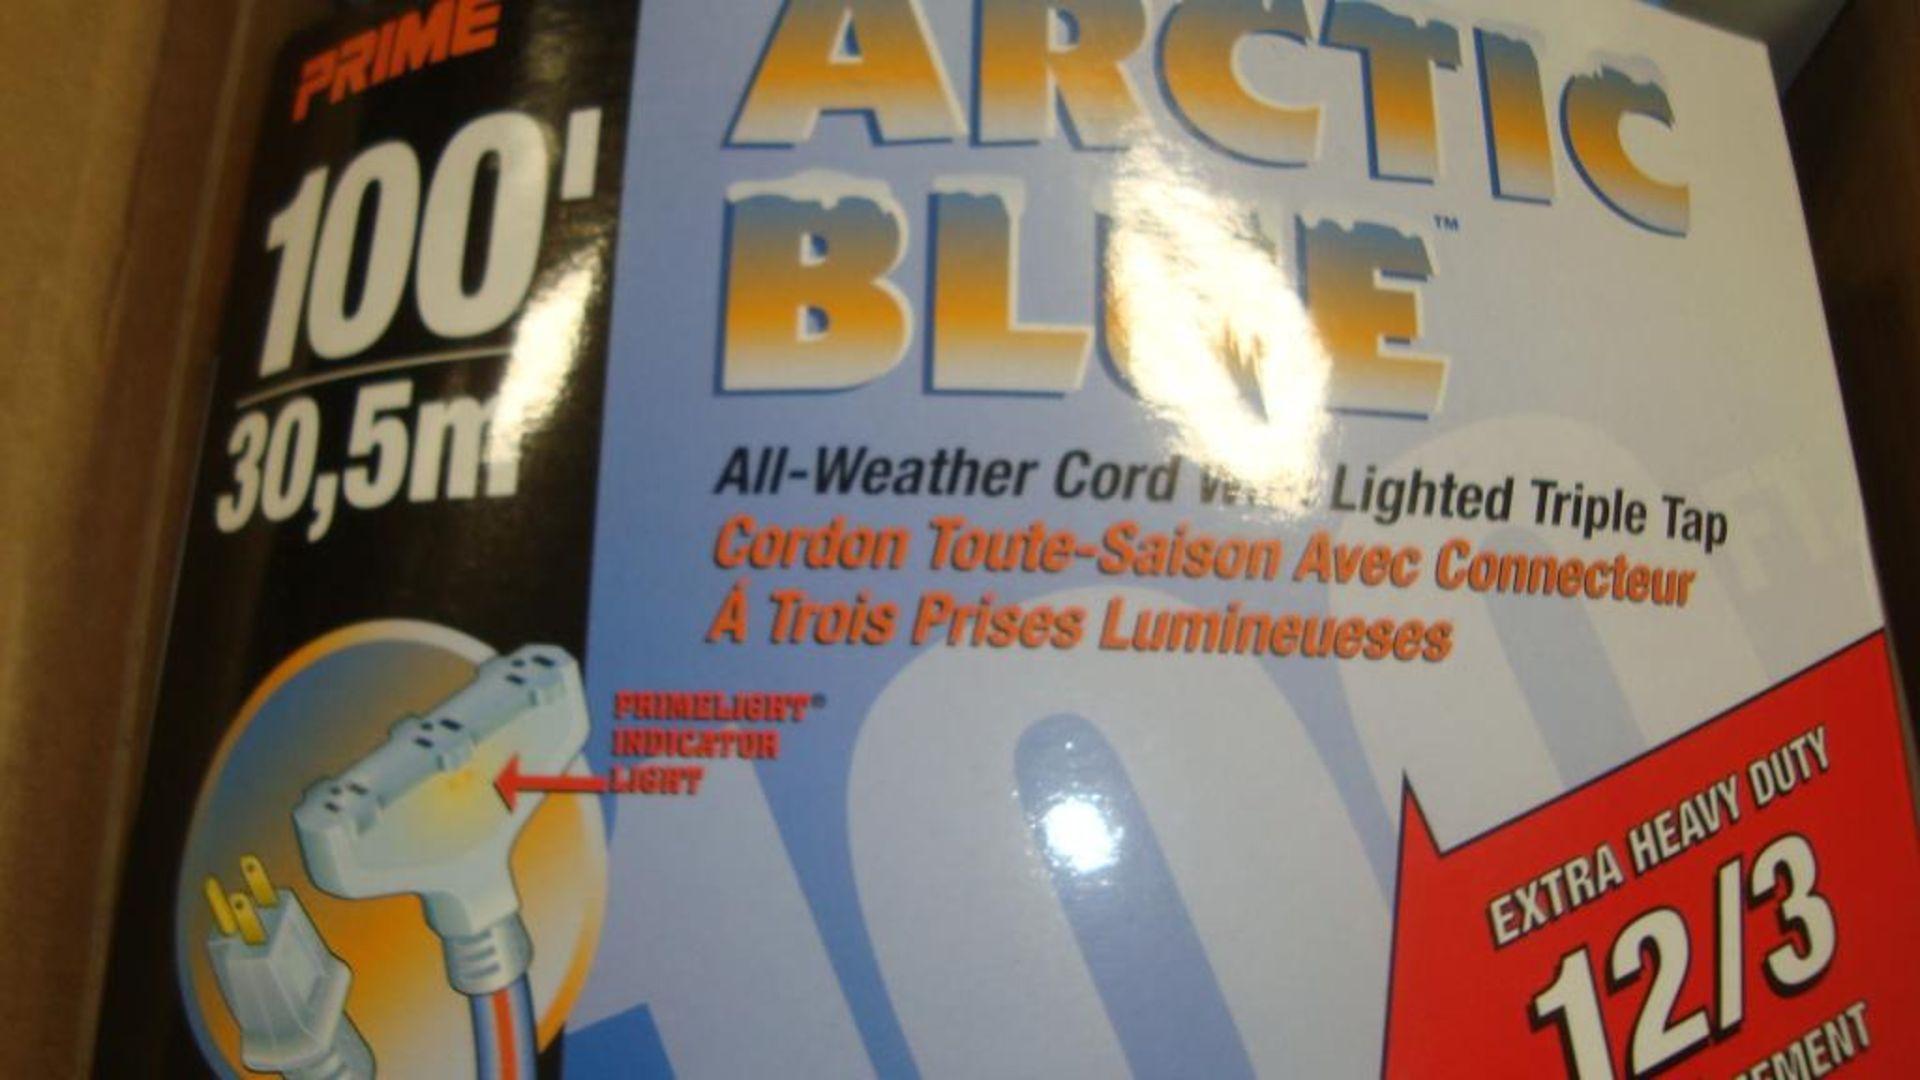 Extension Cords. Lot: 90 Total (30 Boxes - 3 ea.) Prime Wire & Cable pn# LT630835 Arctic Blue 100 - Image 6 of 9